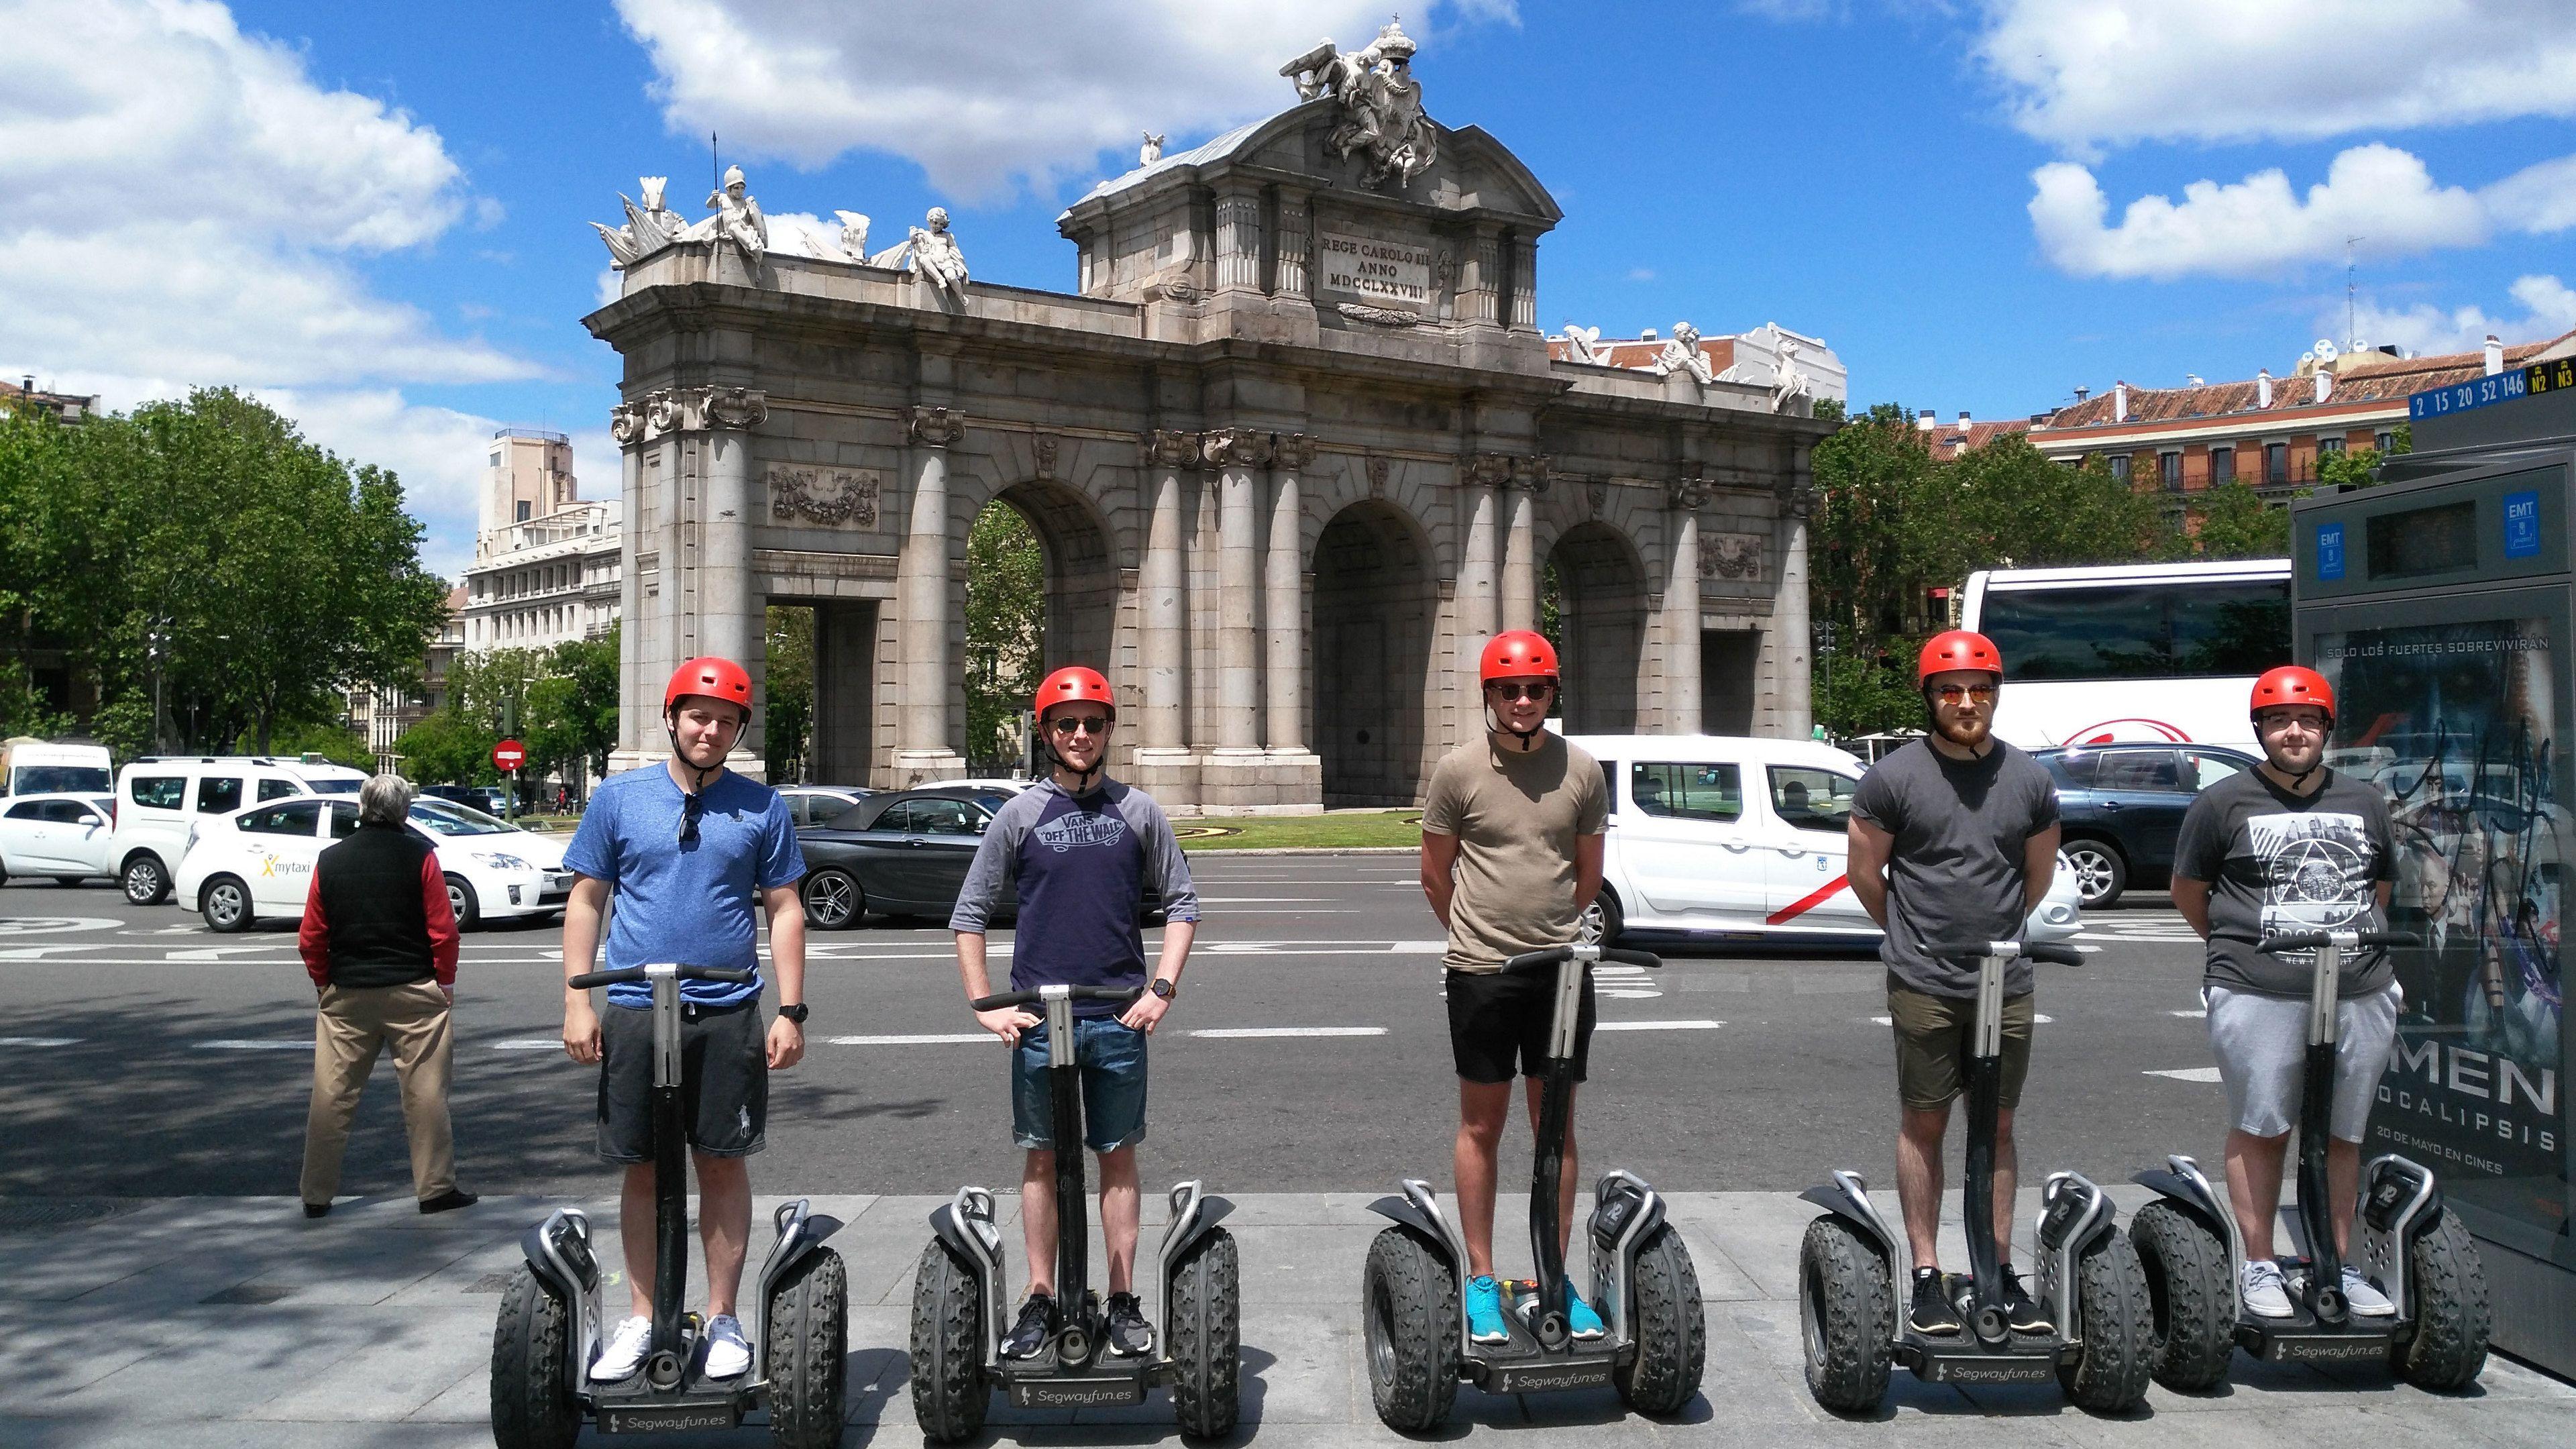 Group on segways in Madrid